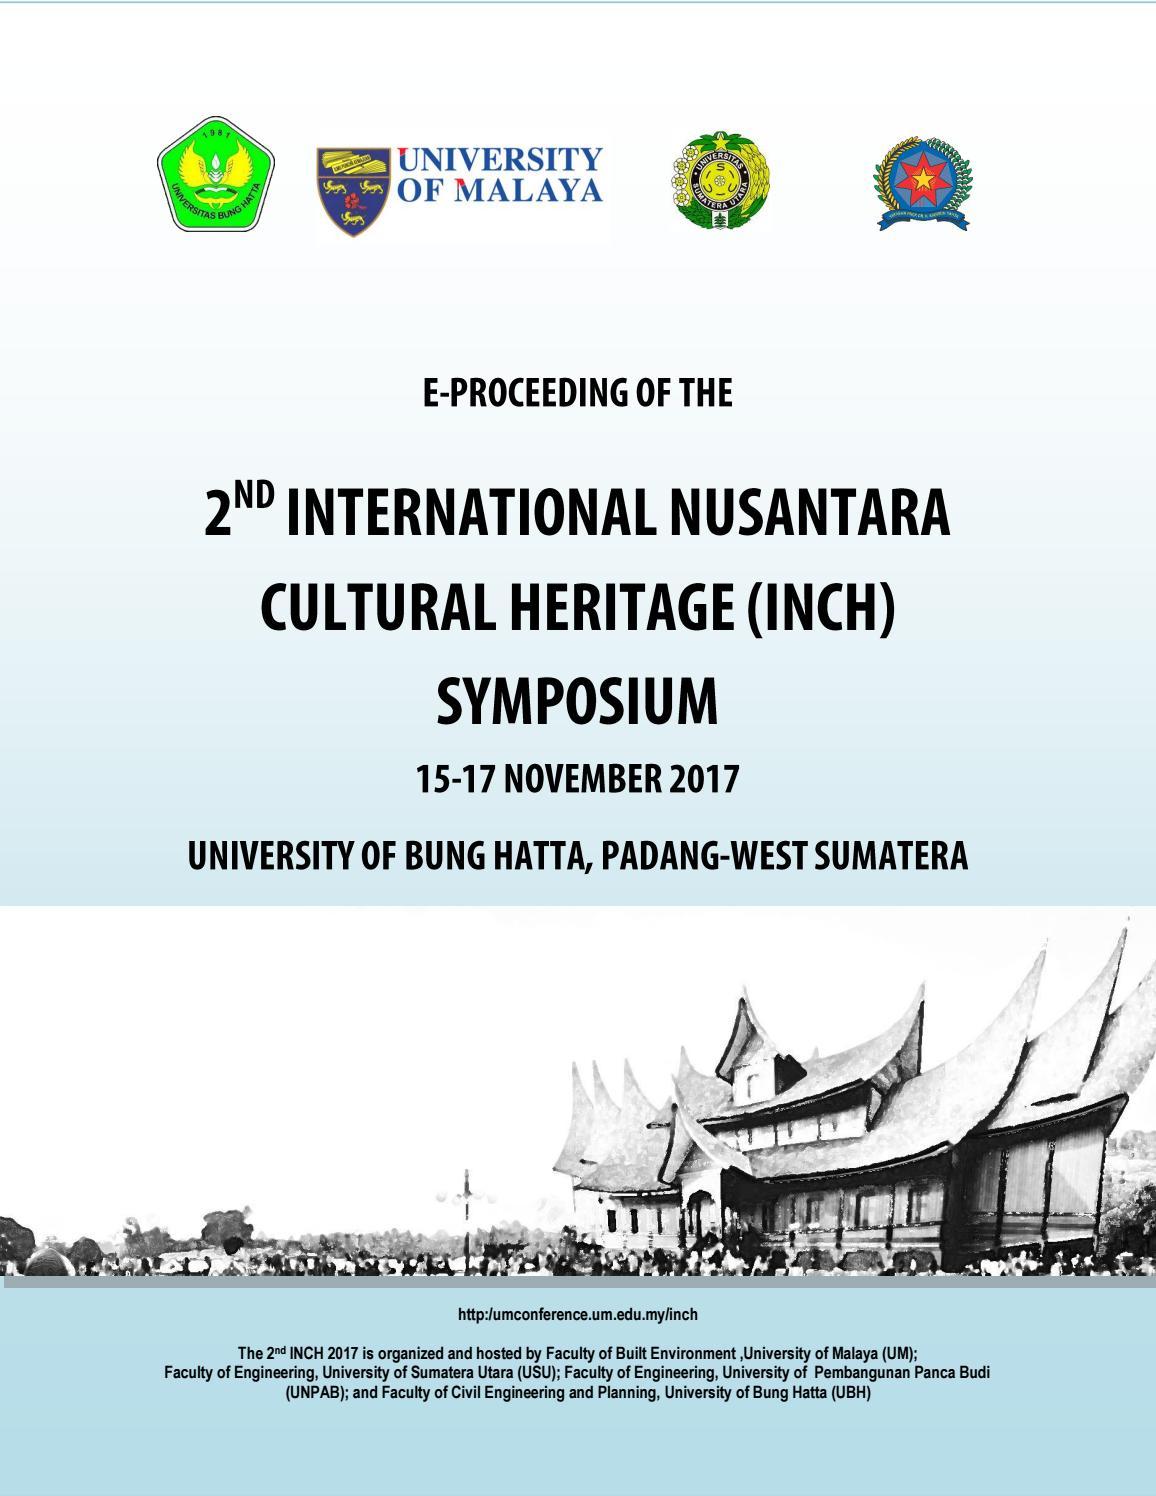 E Proceeding Of The 2nd International Nusantara Cultural Heitage Symposium By Rudielfendes Issuu